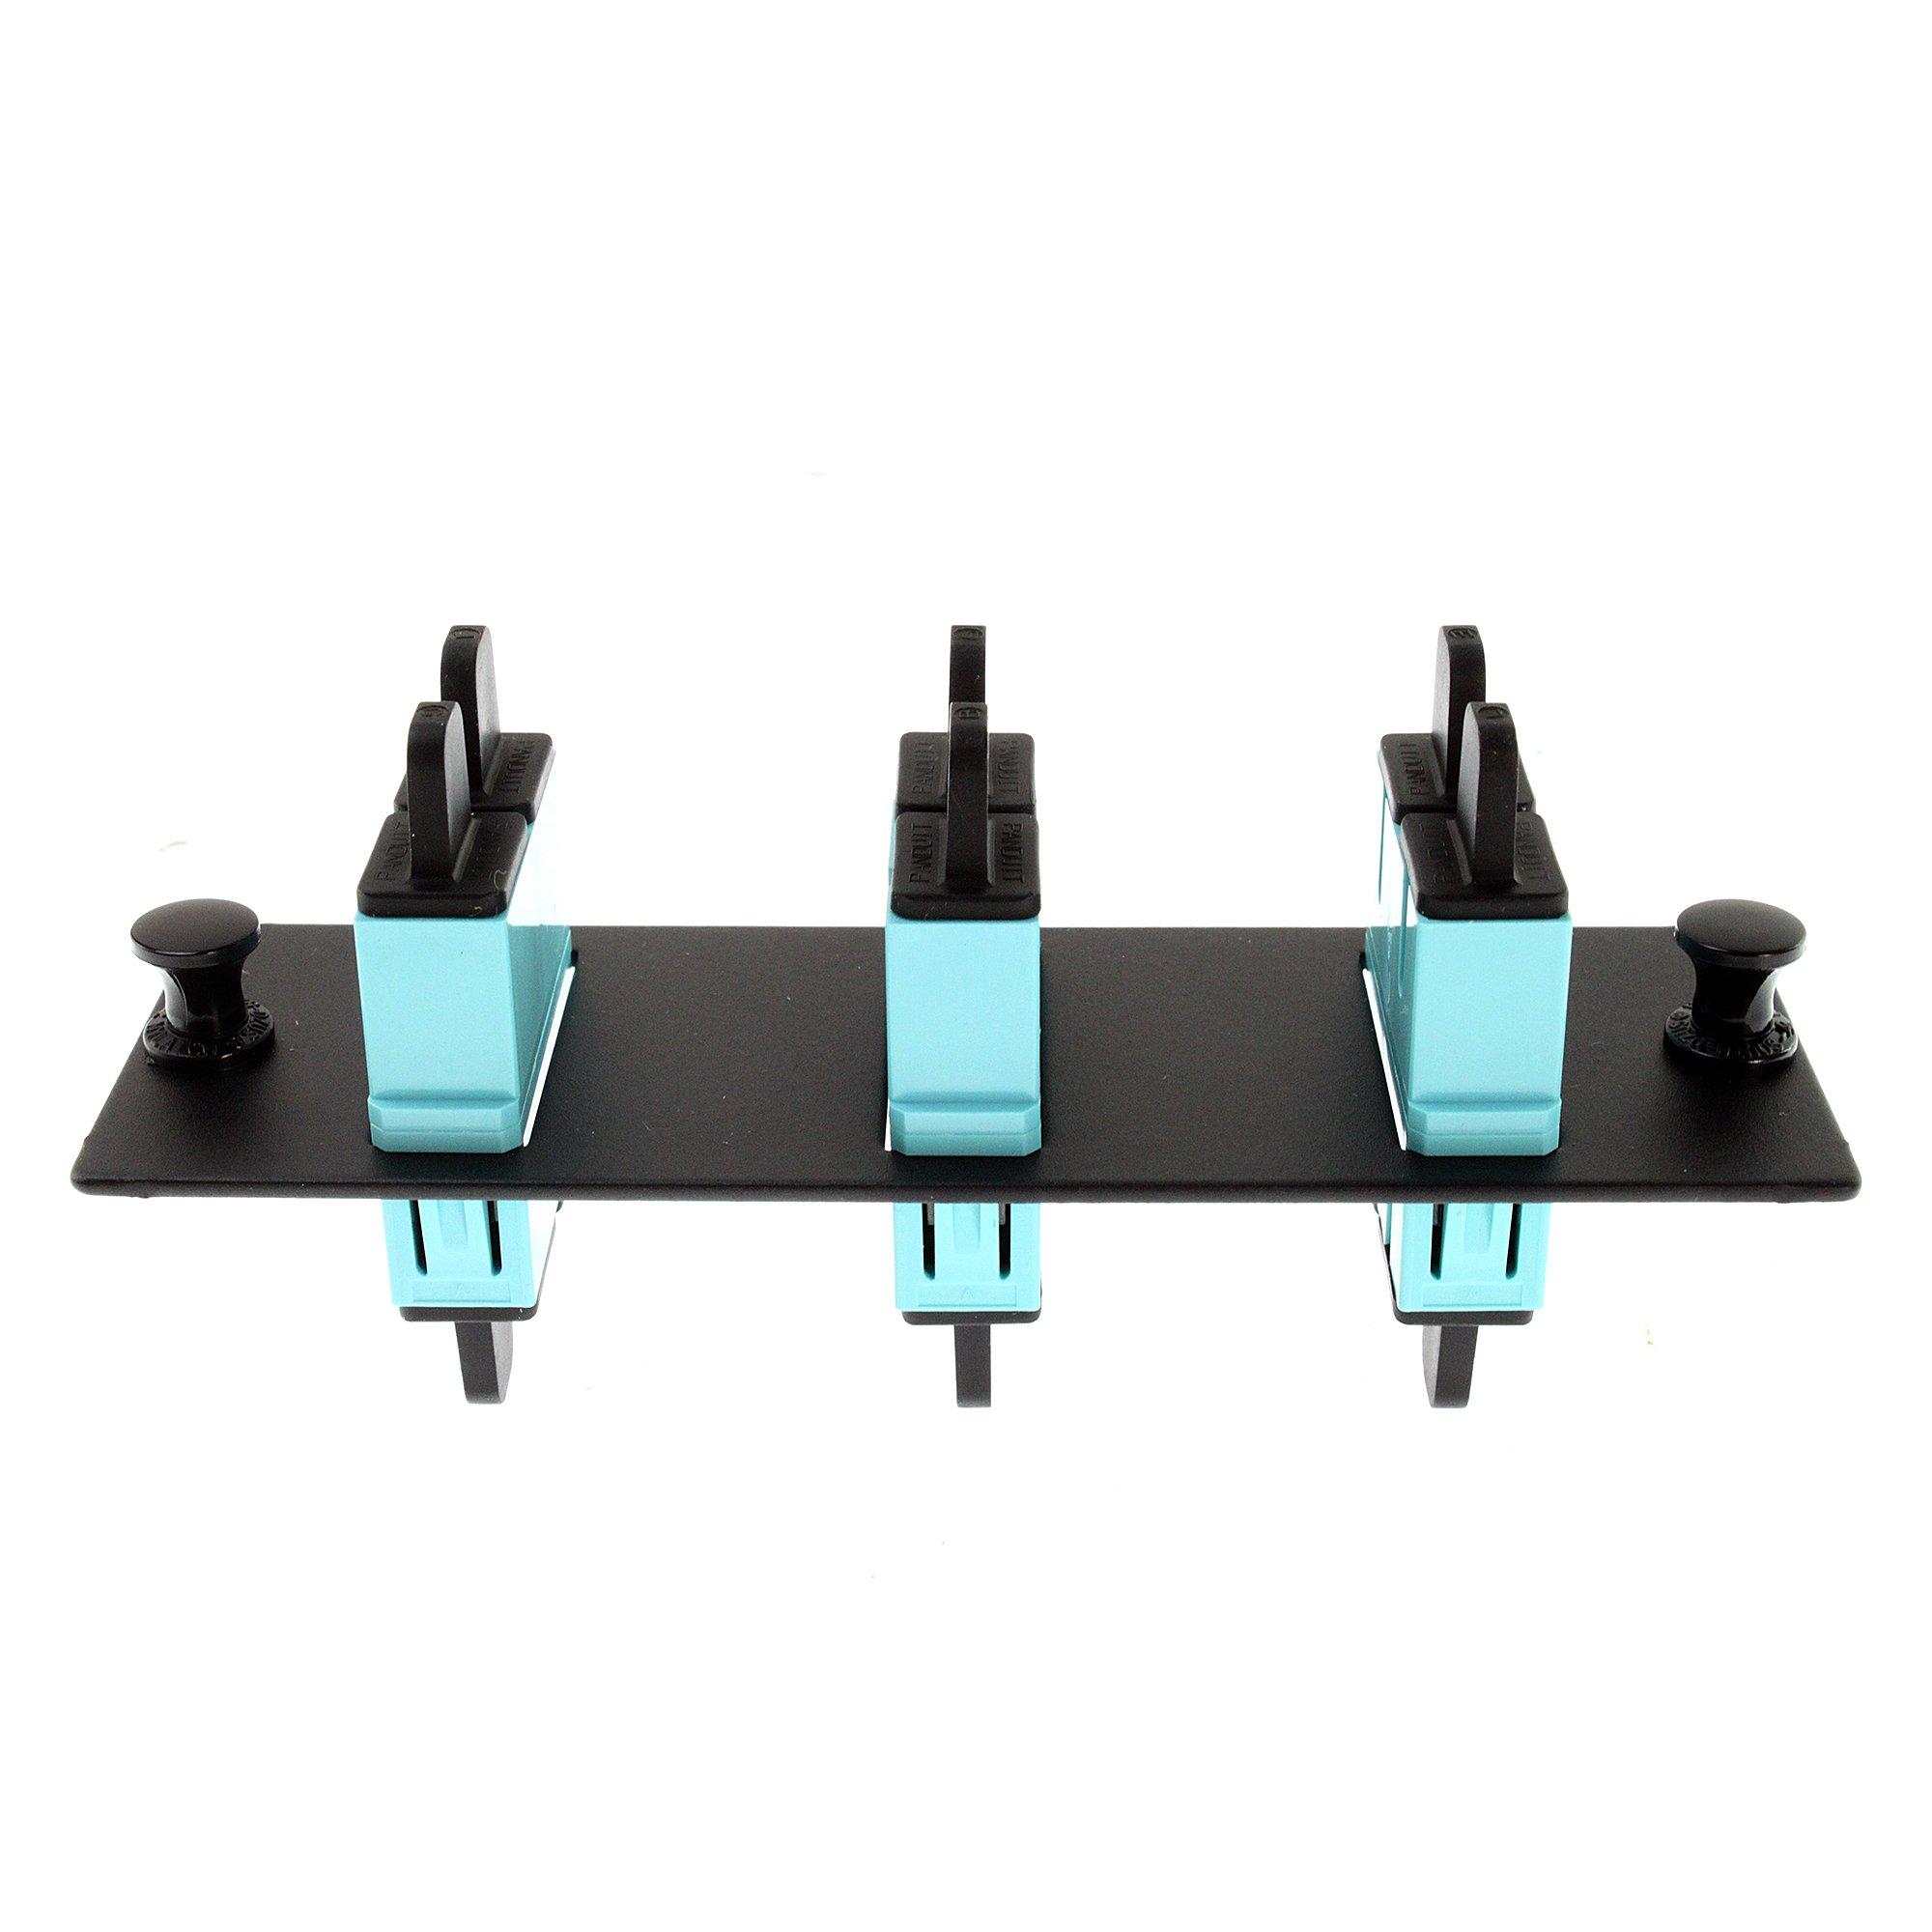 Panduit FAP3WAQDSC Multi-Mode 3-Port Fiber Adapter Panel with Phosphor Bronze Split Sleeve, Aqua